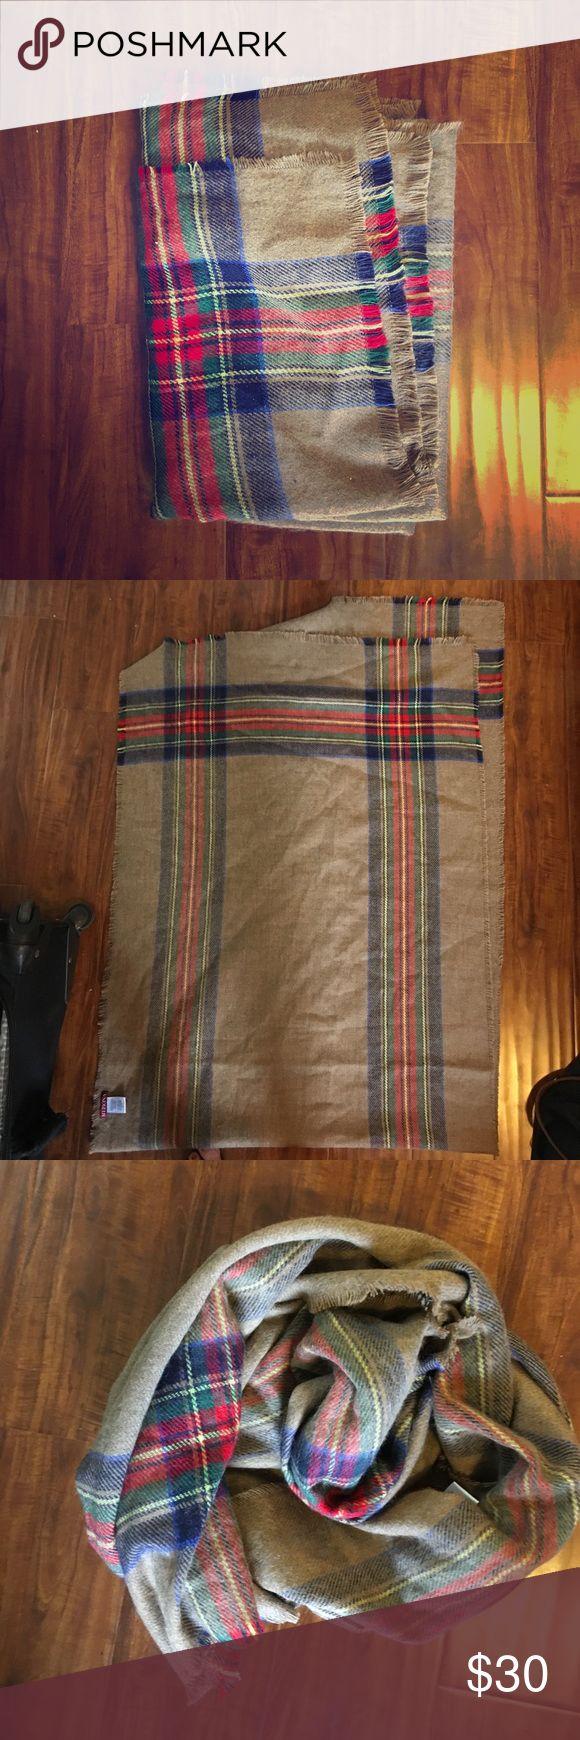 Selling this Beautiful Blanket Scarf on Poshmark! My username is: stylishsuitcase. #shopmycloset #poshmark #fashion #shopping #style #forsale #Accessories